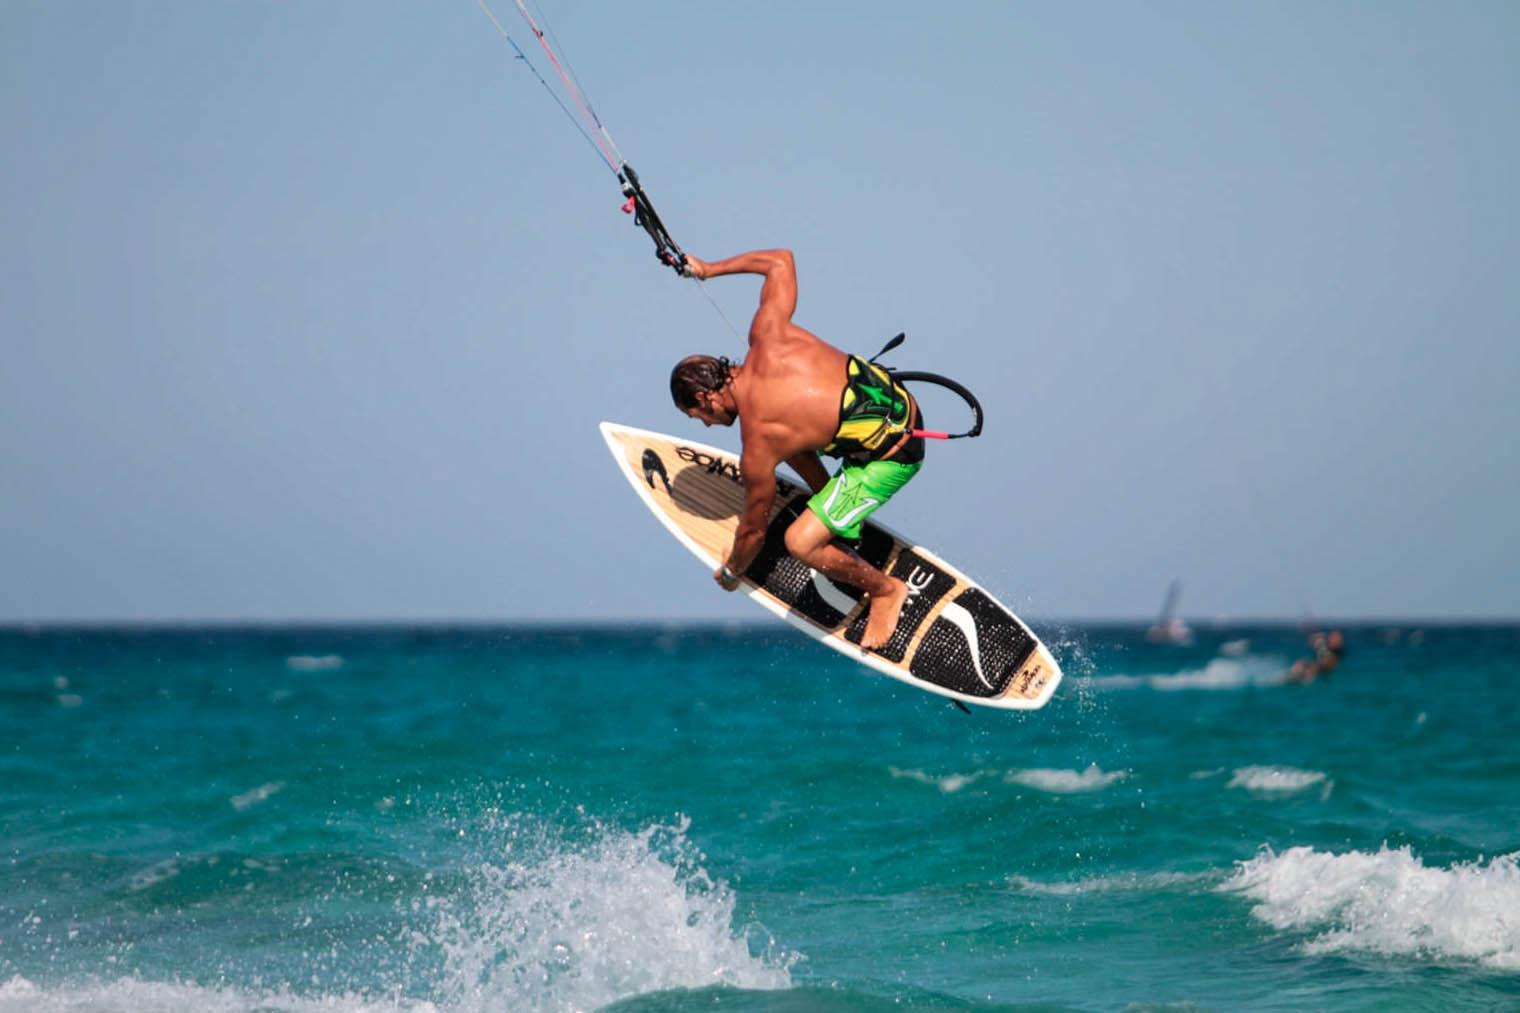 tavola-kitesurf-surf-21408-35547531